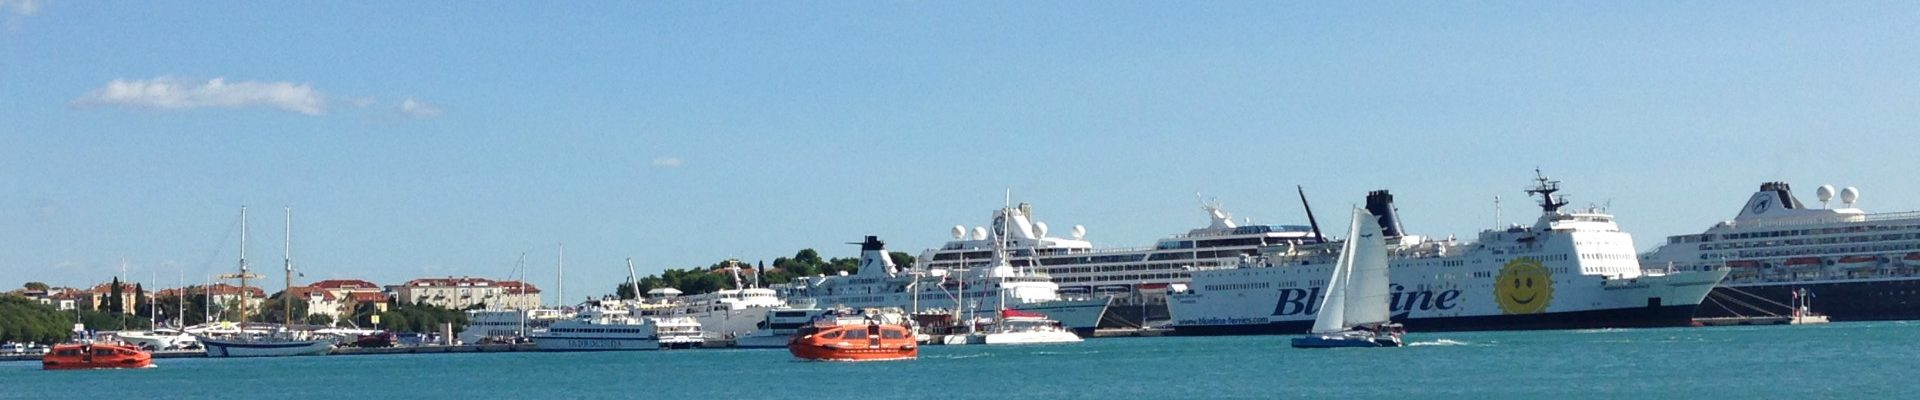 Croatia Ferry strip 3